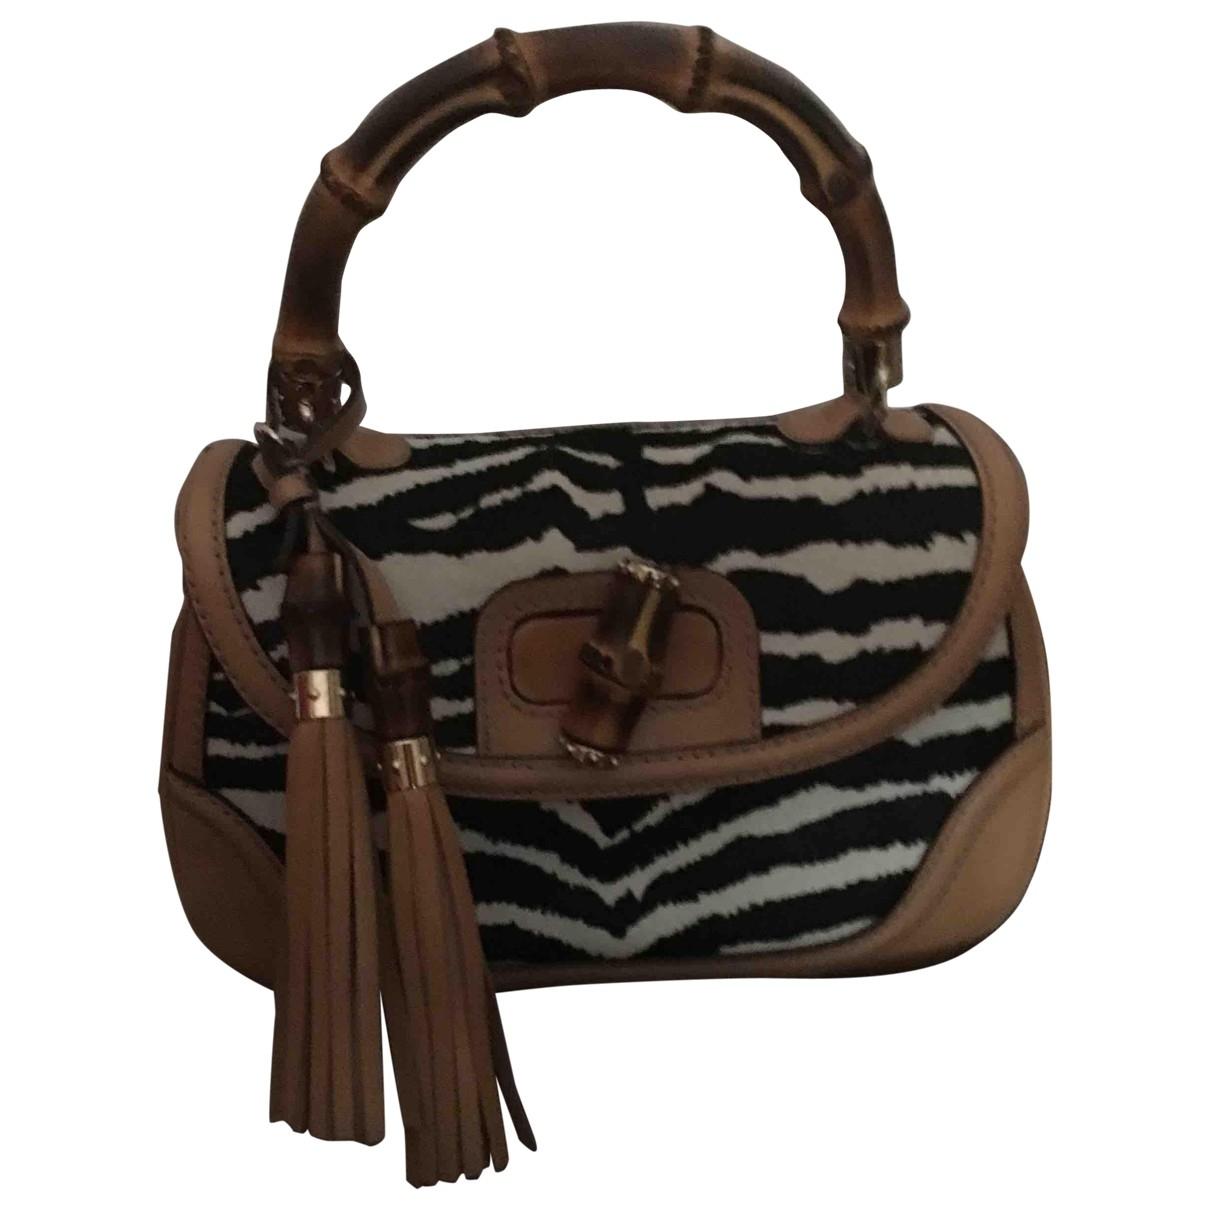 Gucci Bamboo Multicolour Pony-style calfskin handbag for Women \N